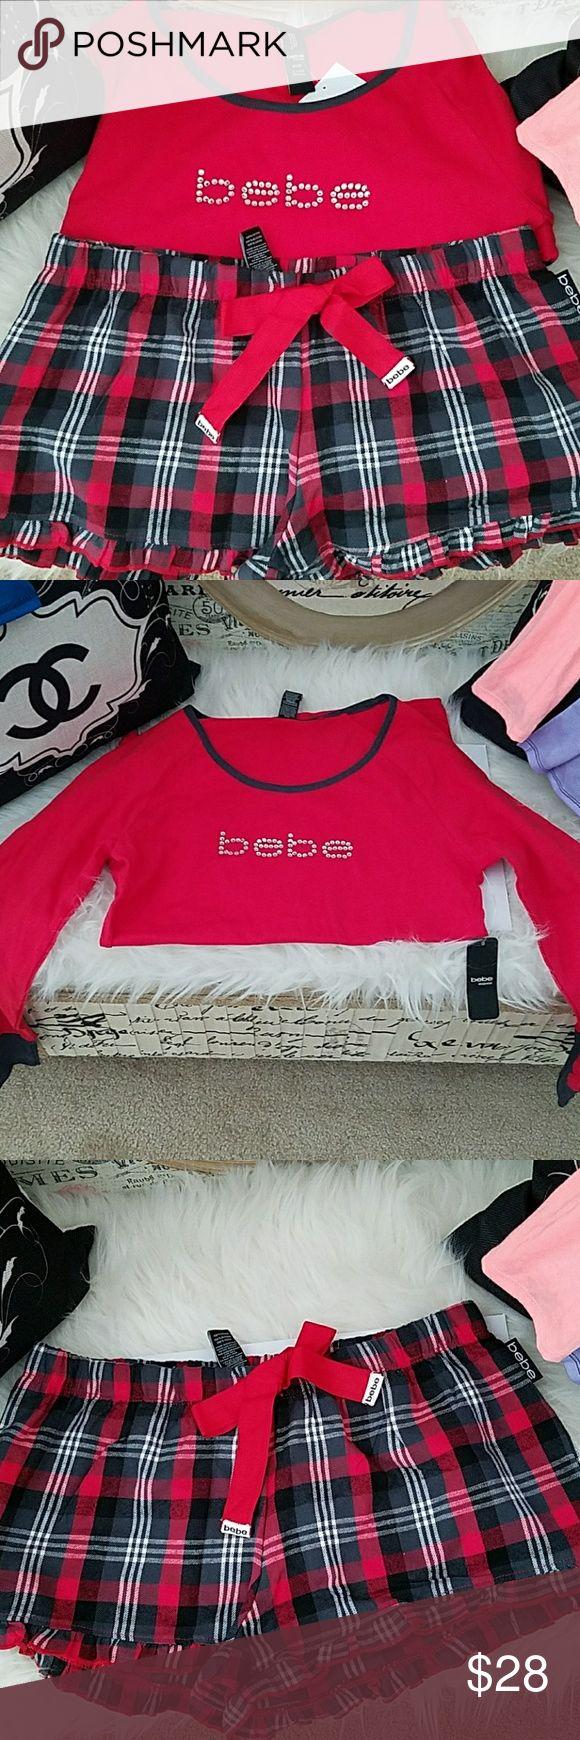 Bebe Pajama Short set S New with tags. Plaid pj shorts with ruffles and long sleeve rhinestone top. Love it or list it item. bebe Intimates & Sleepwear Pajamas